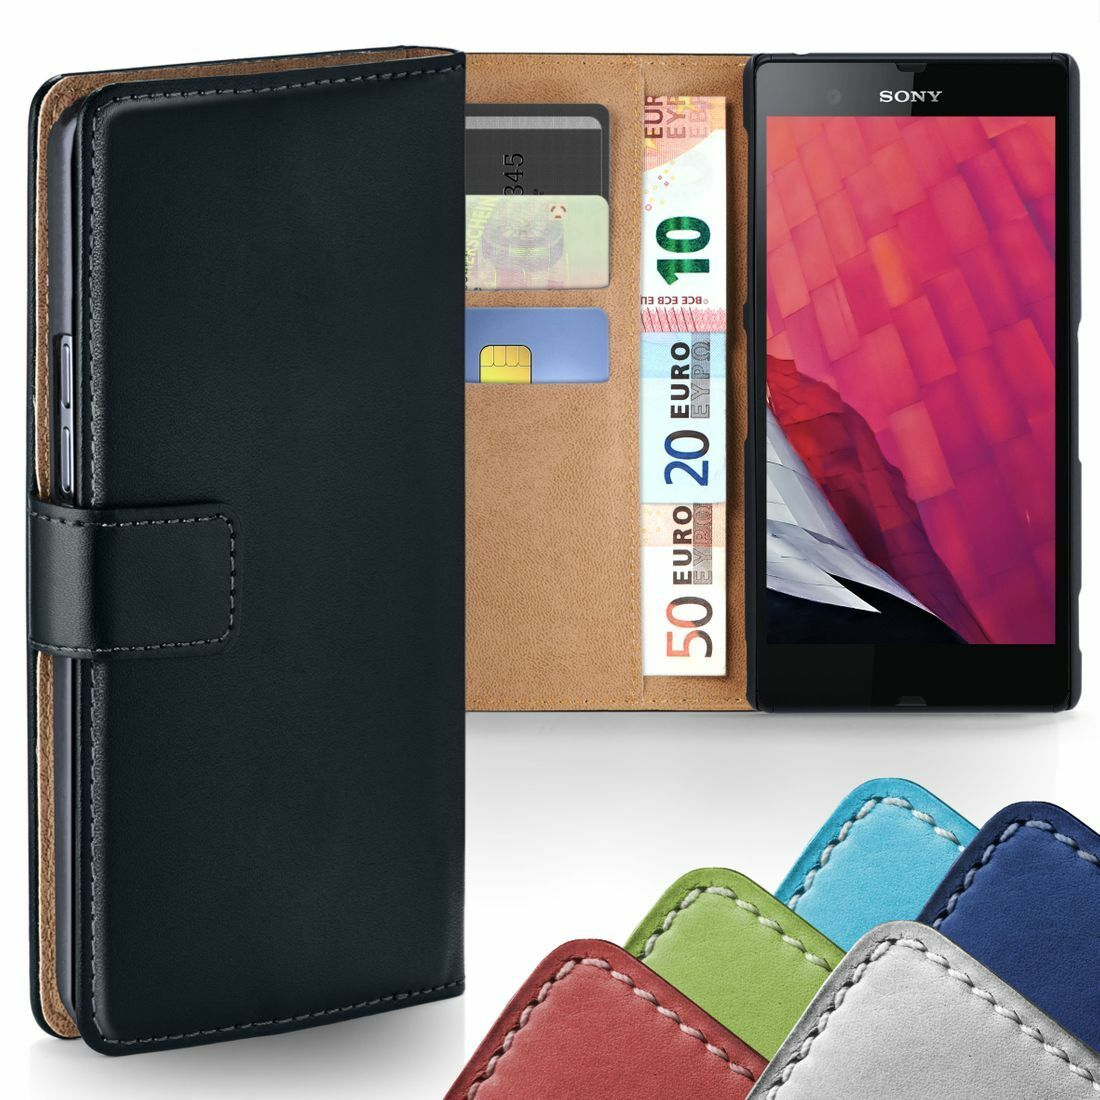 360 Grad Schutz Hülle für Sony Xperia Z Etui Klapp Hülle Komplett Full Book Case